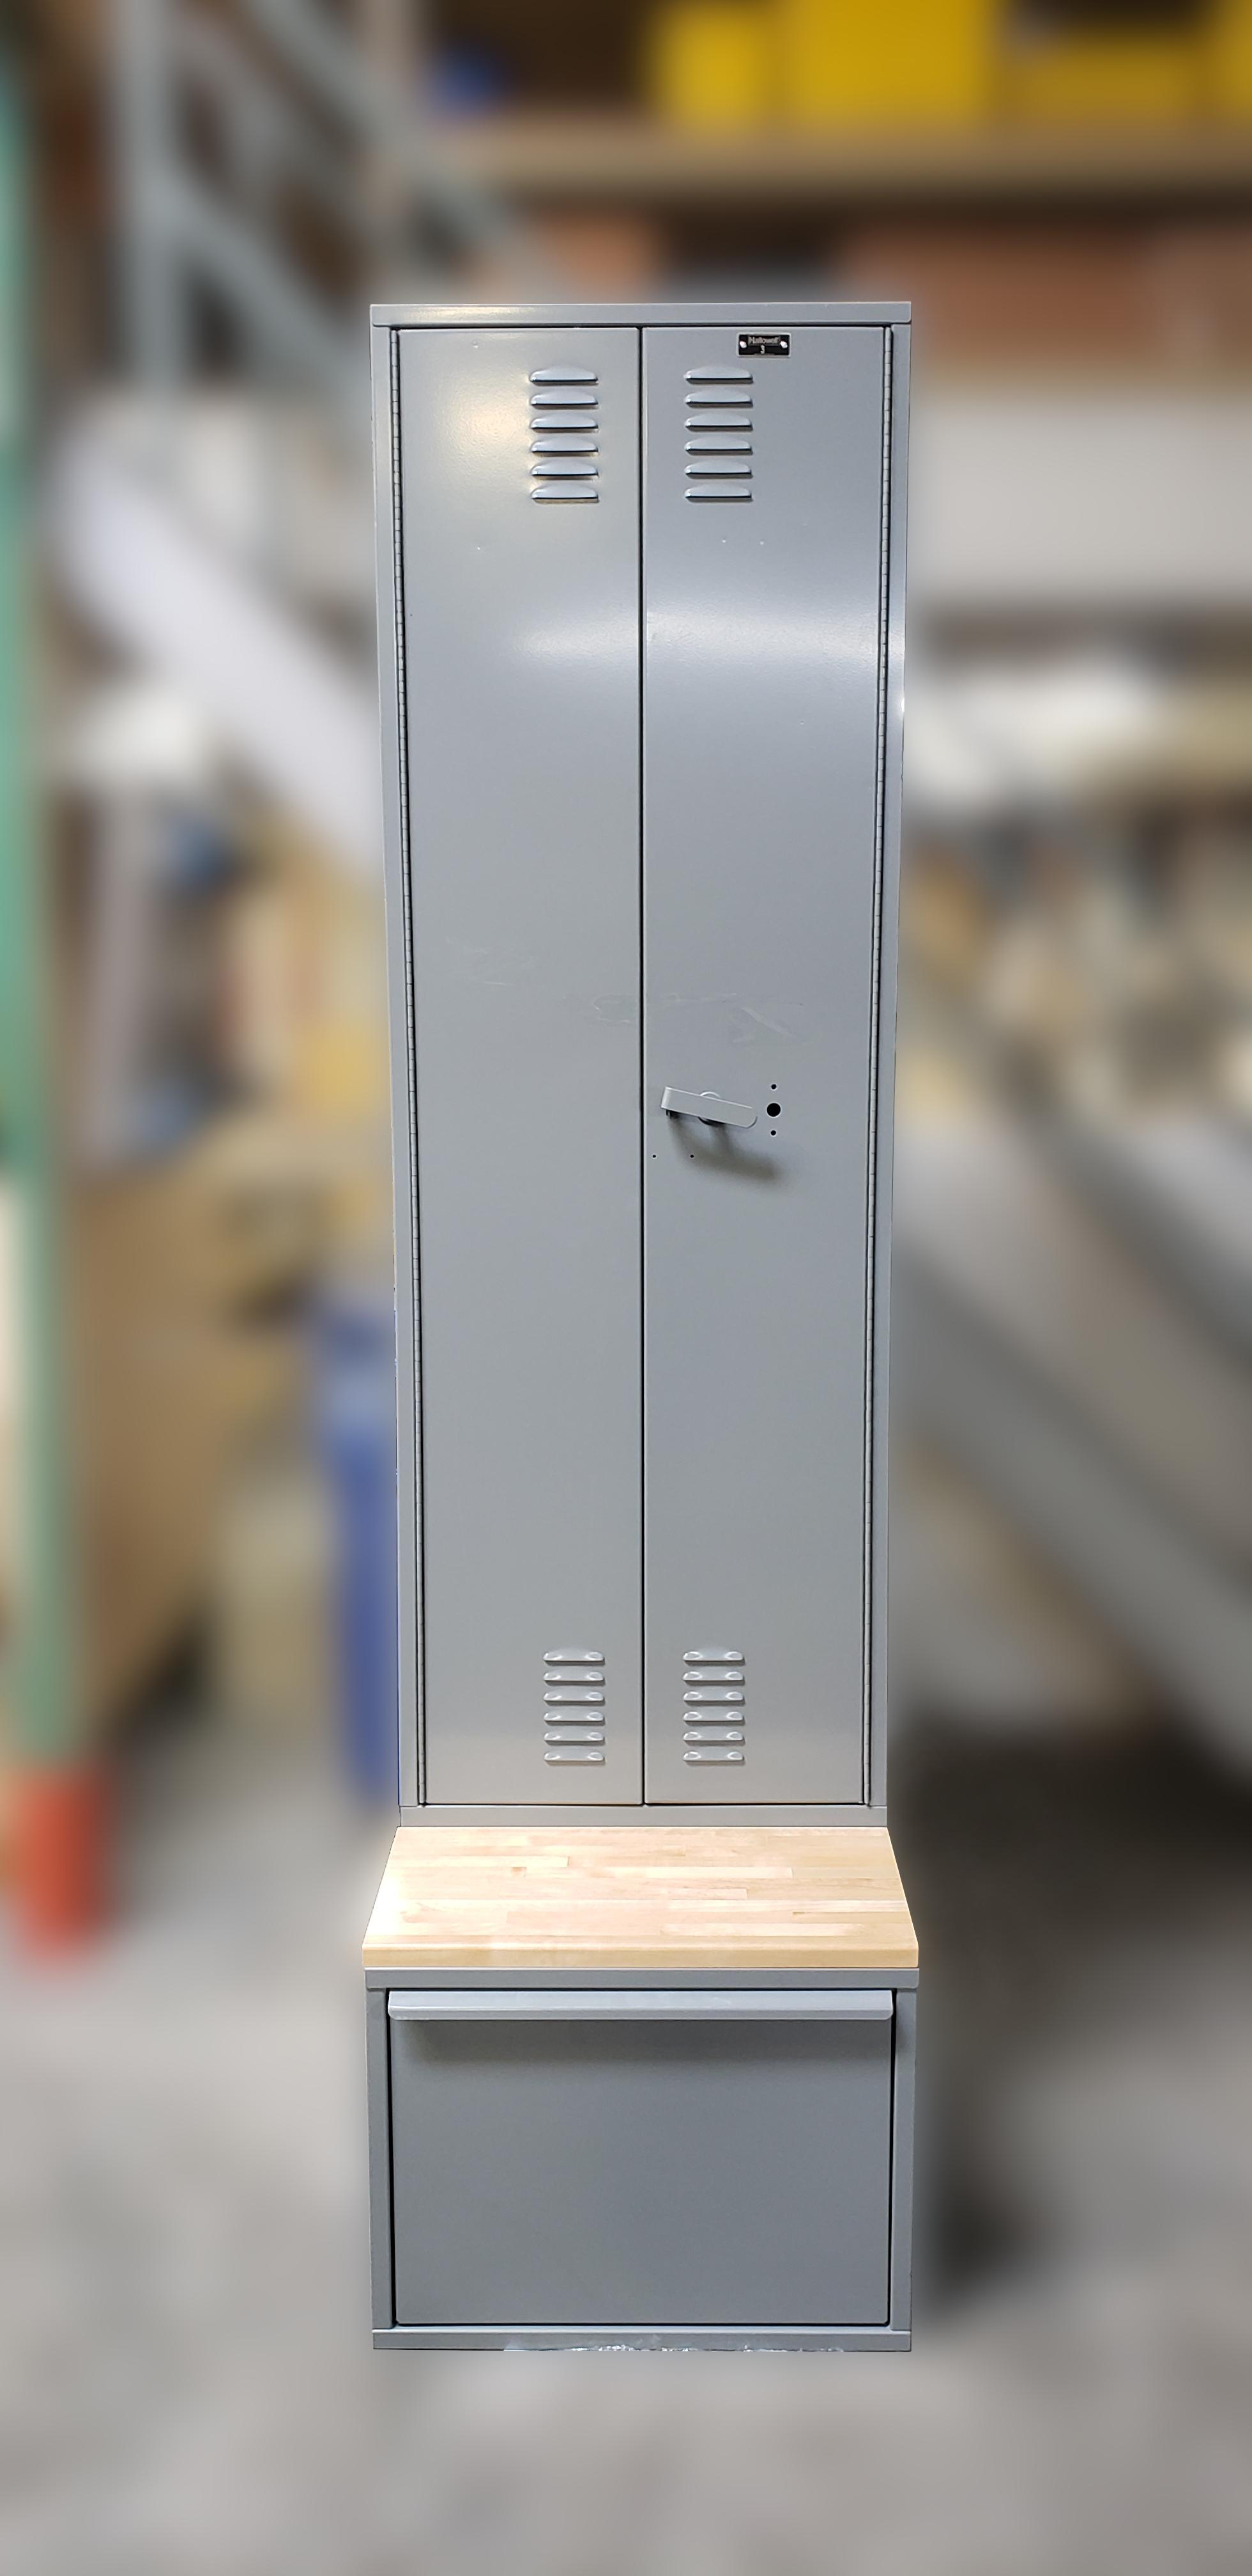 gear-locker-image.jpg